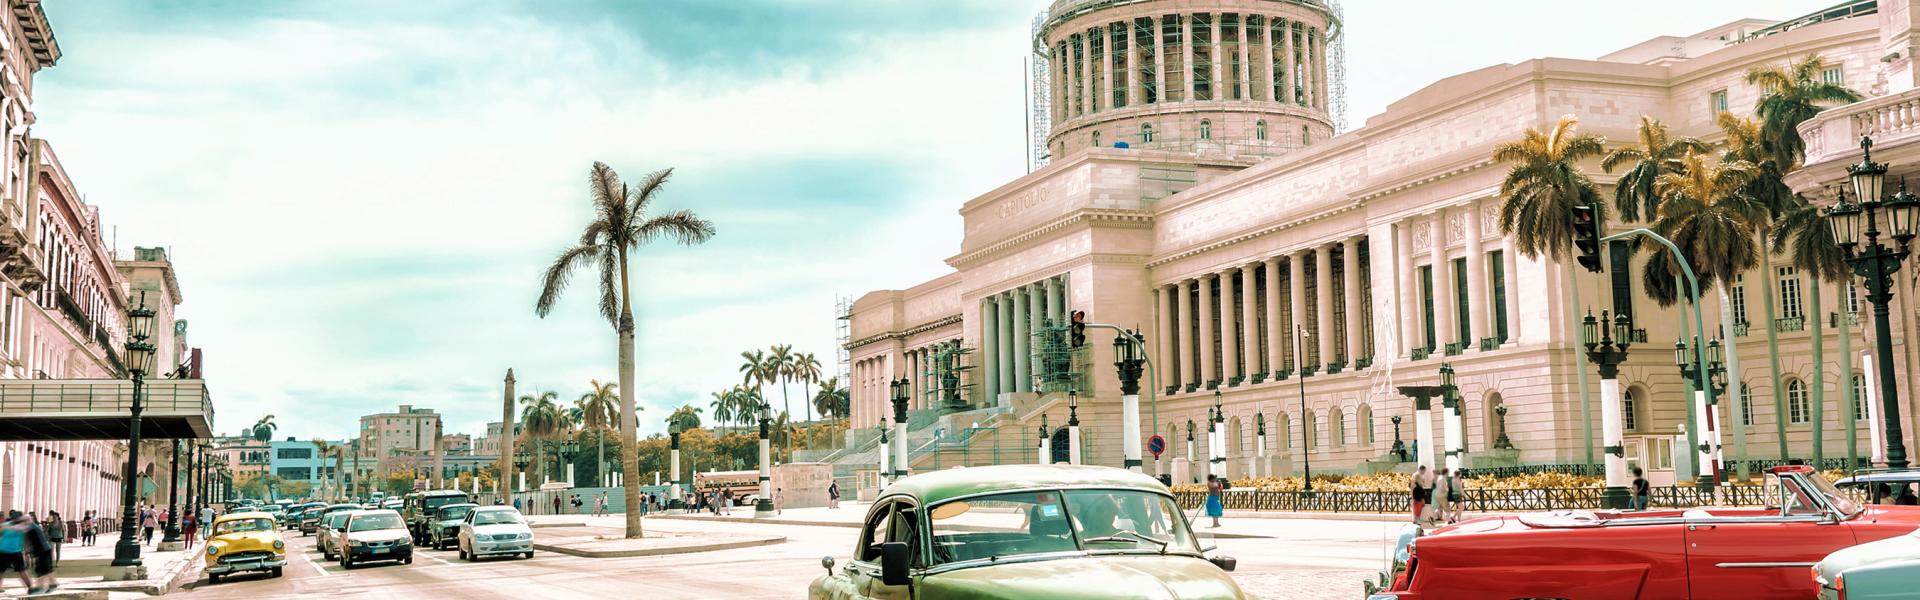 Flug Kuba Fluge Billigfluge Nach Kuba Gunstig Online Buchen